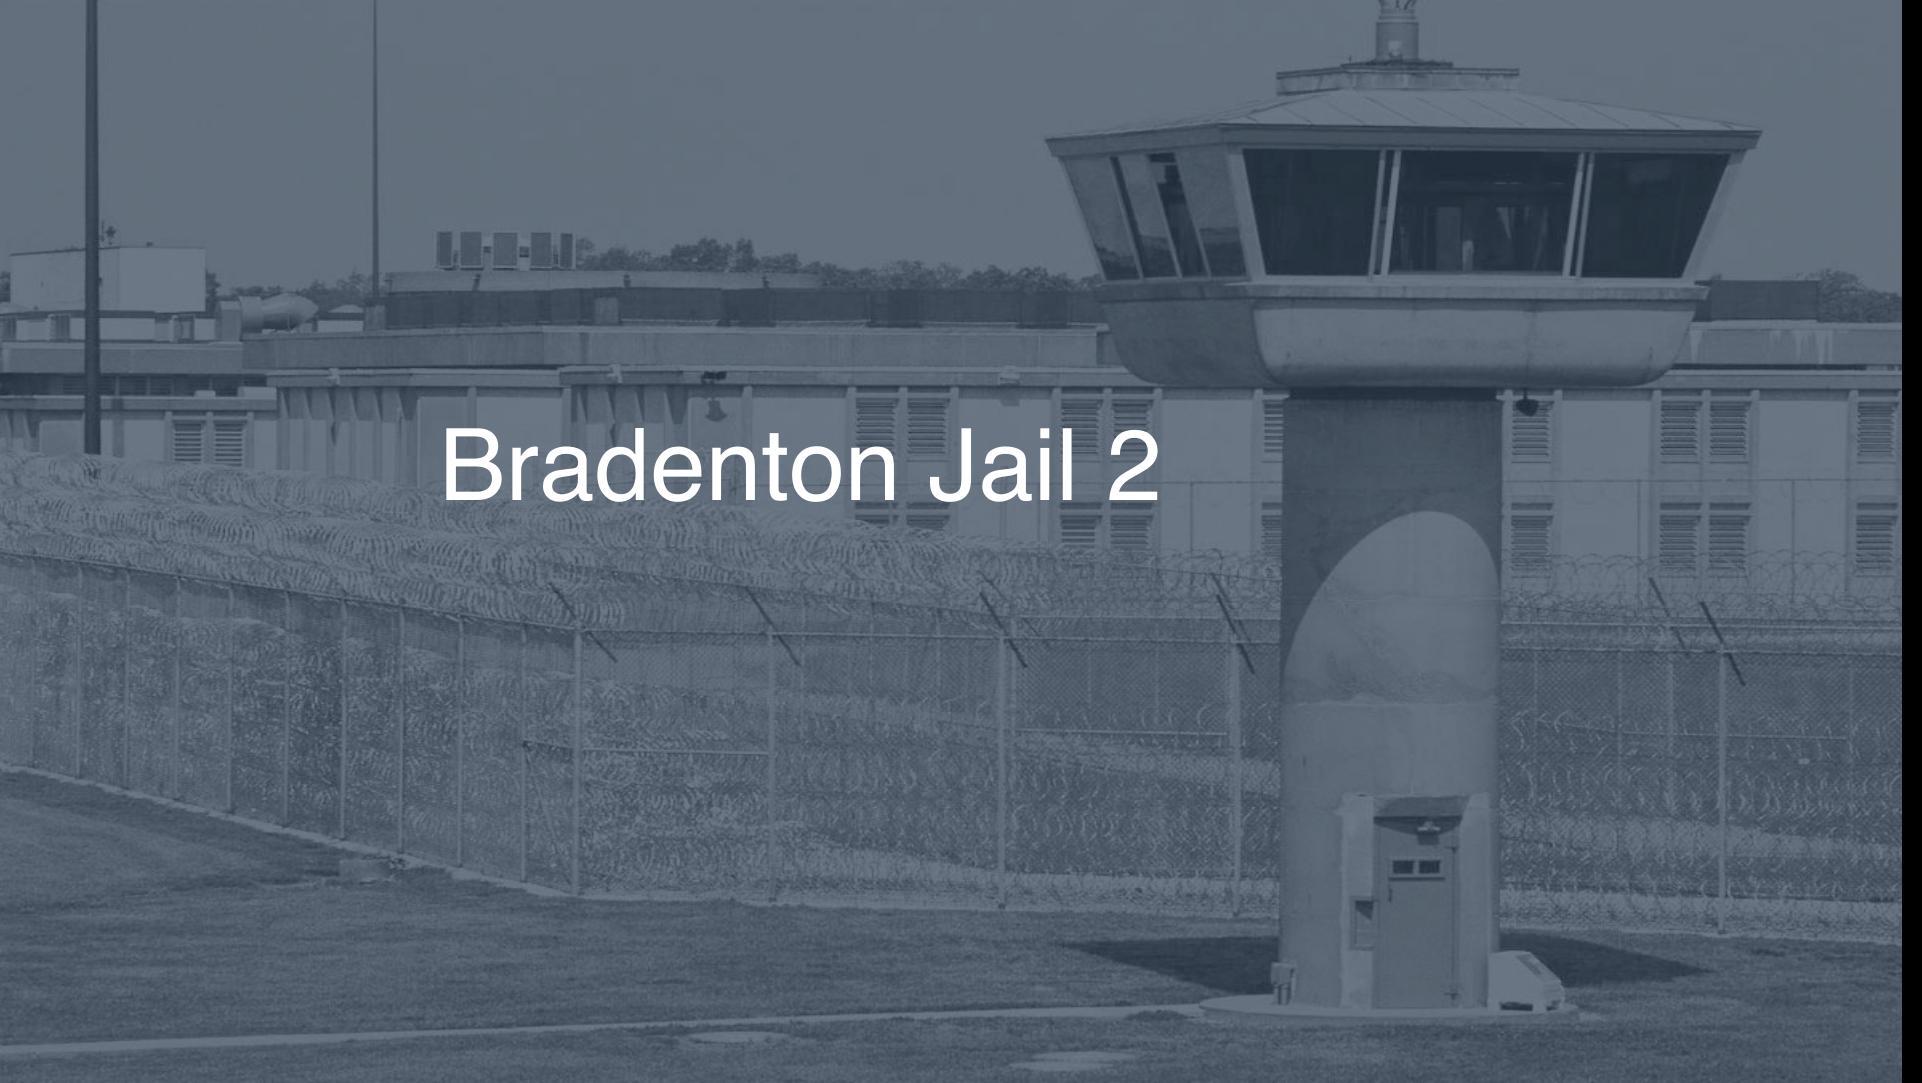 Bradenton Jail correctional facility picture